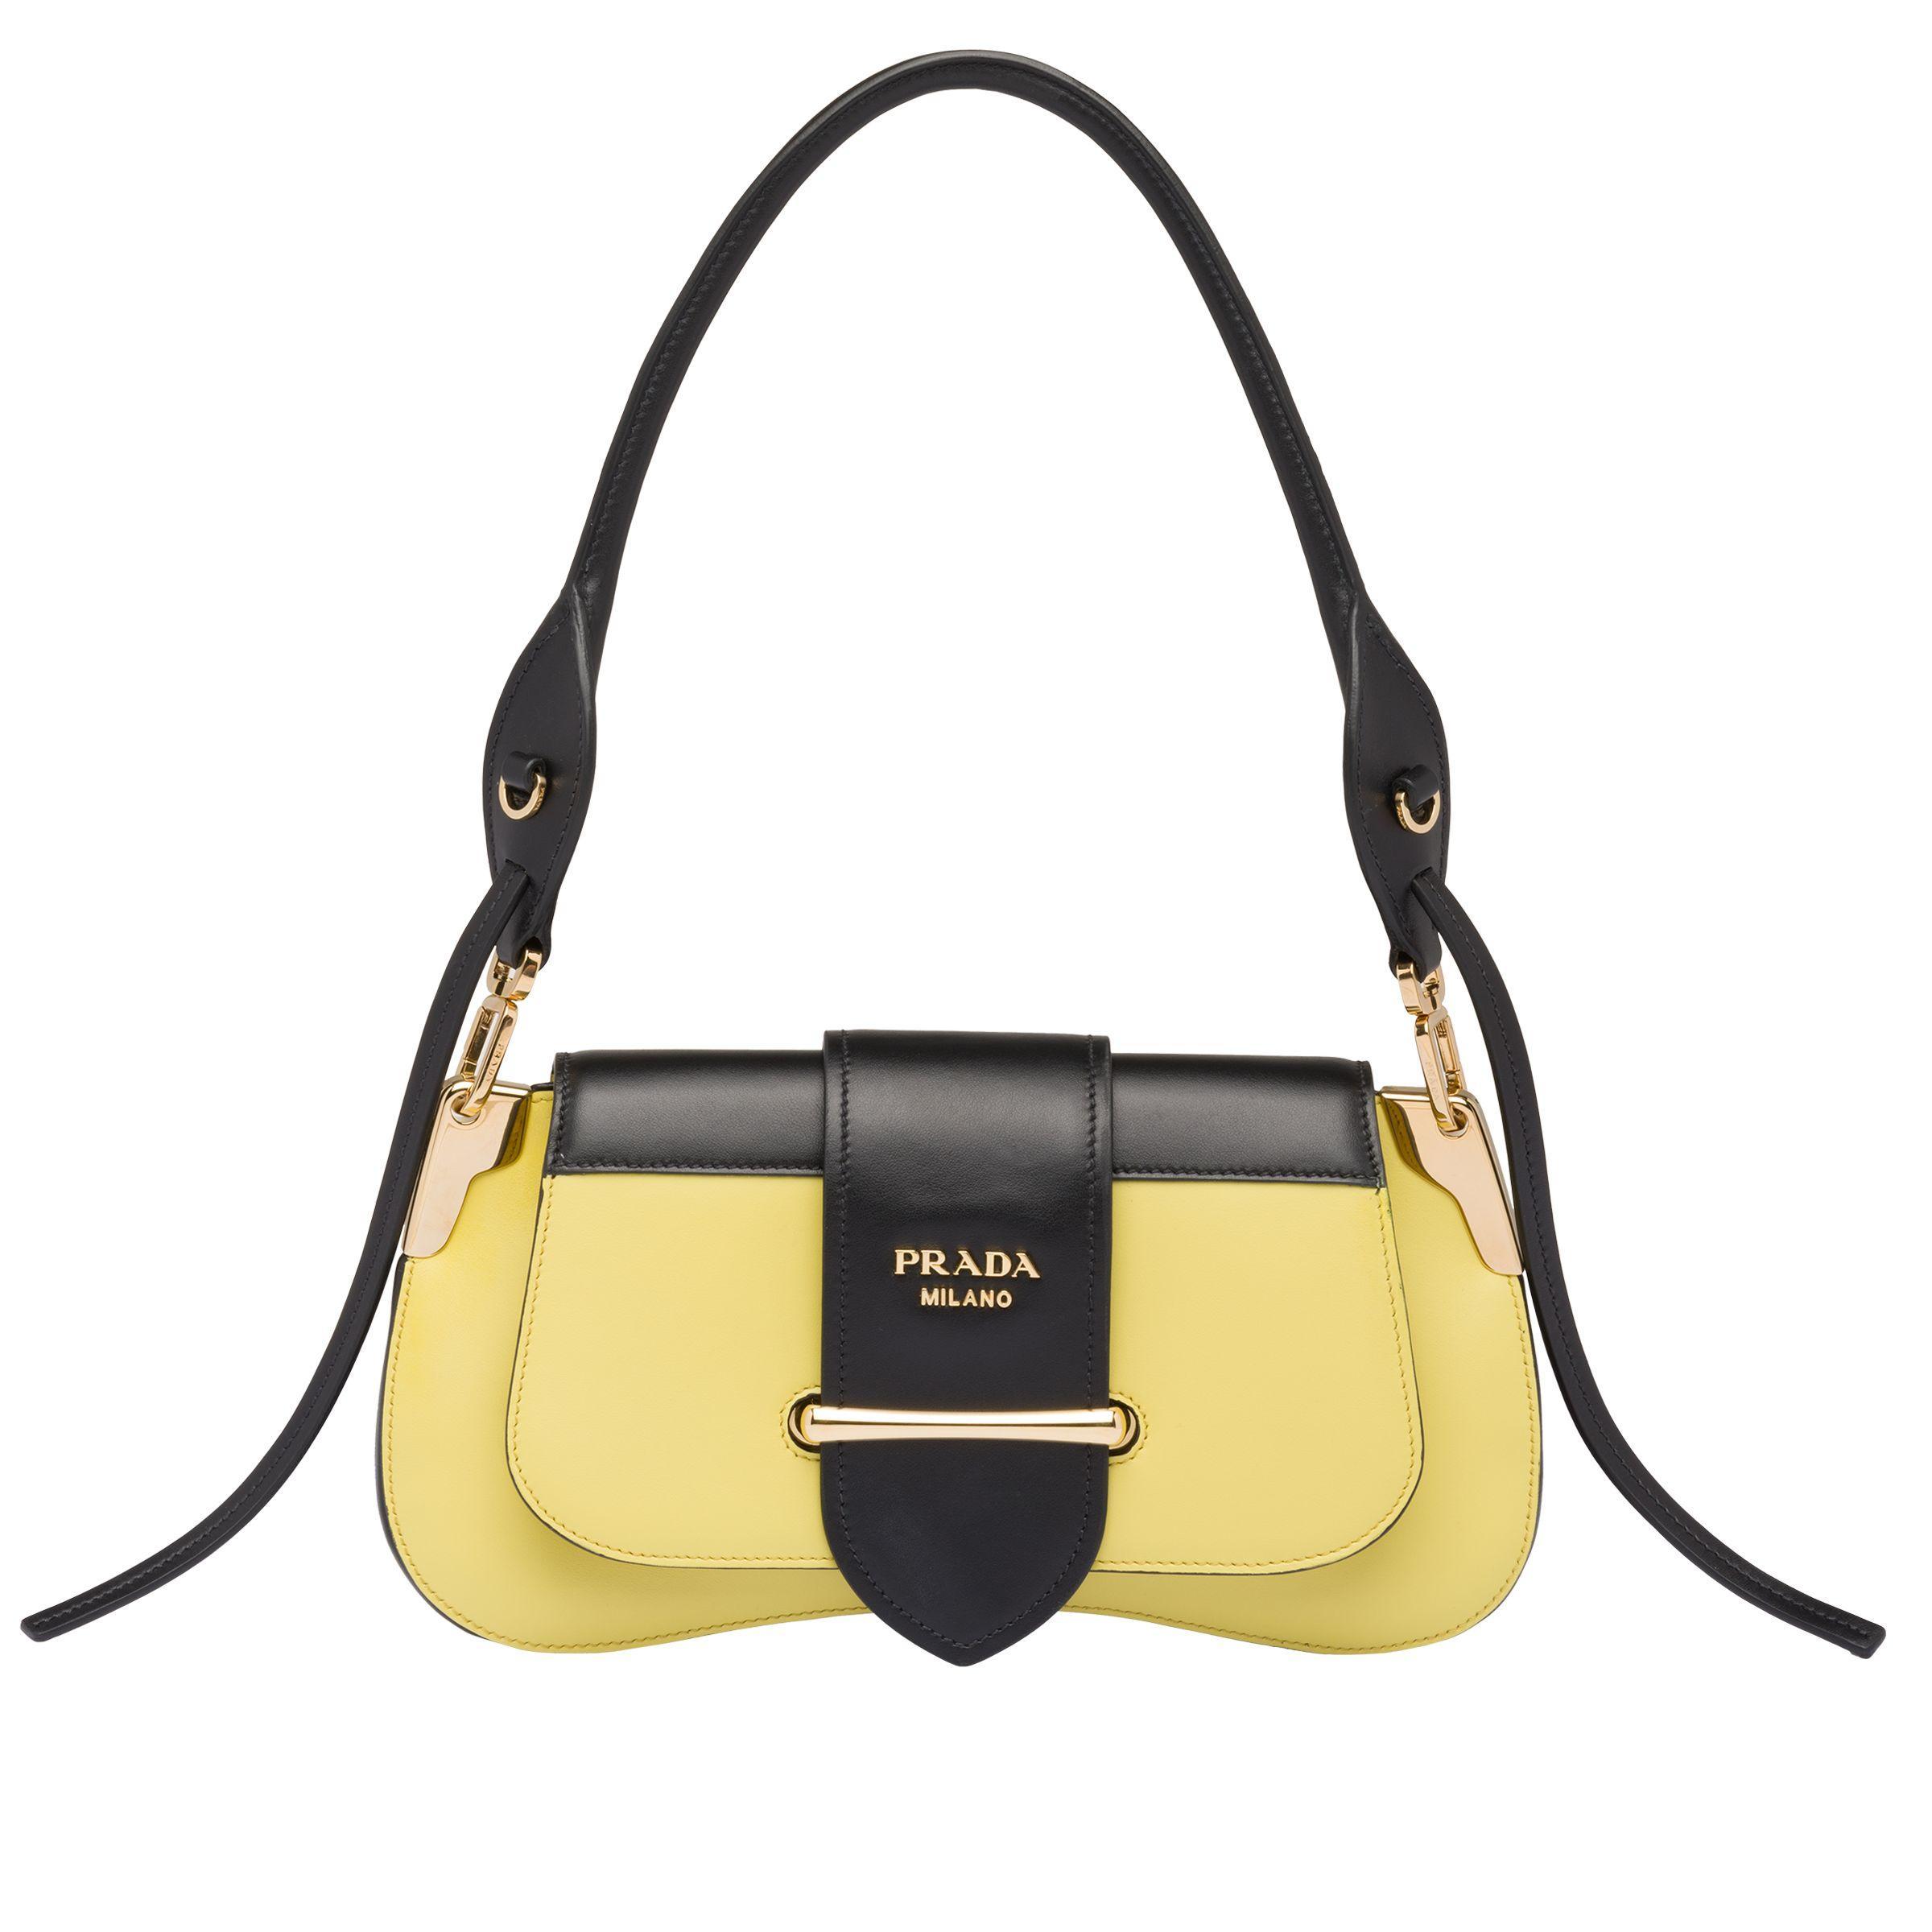 626a2d63fd2e14 Prada. Women's Sidonie Leather Shoulder Bag